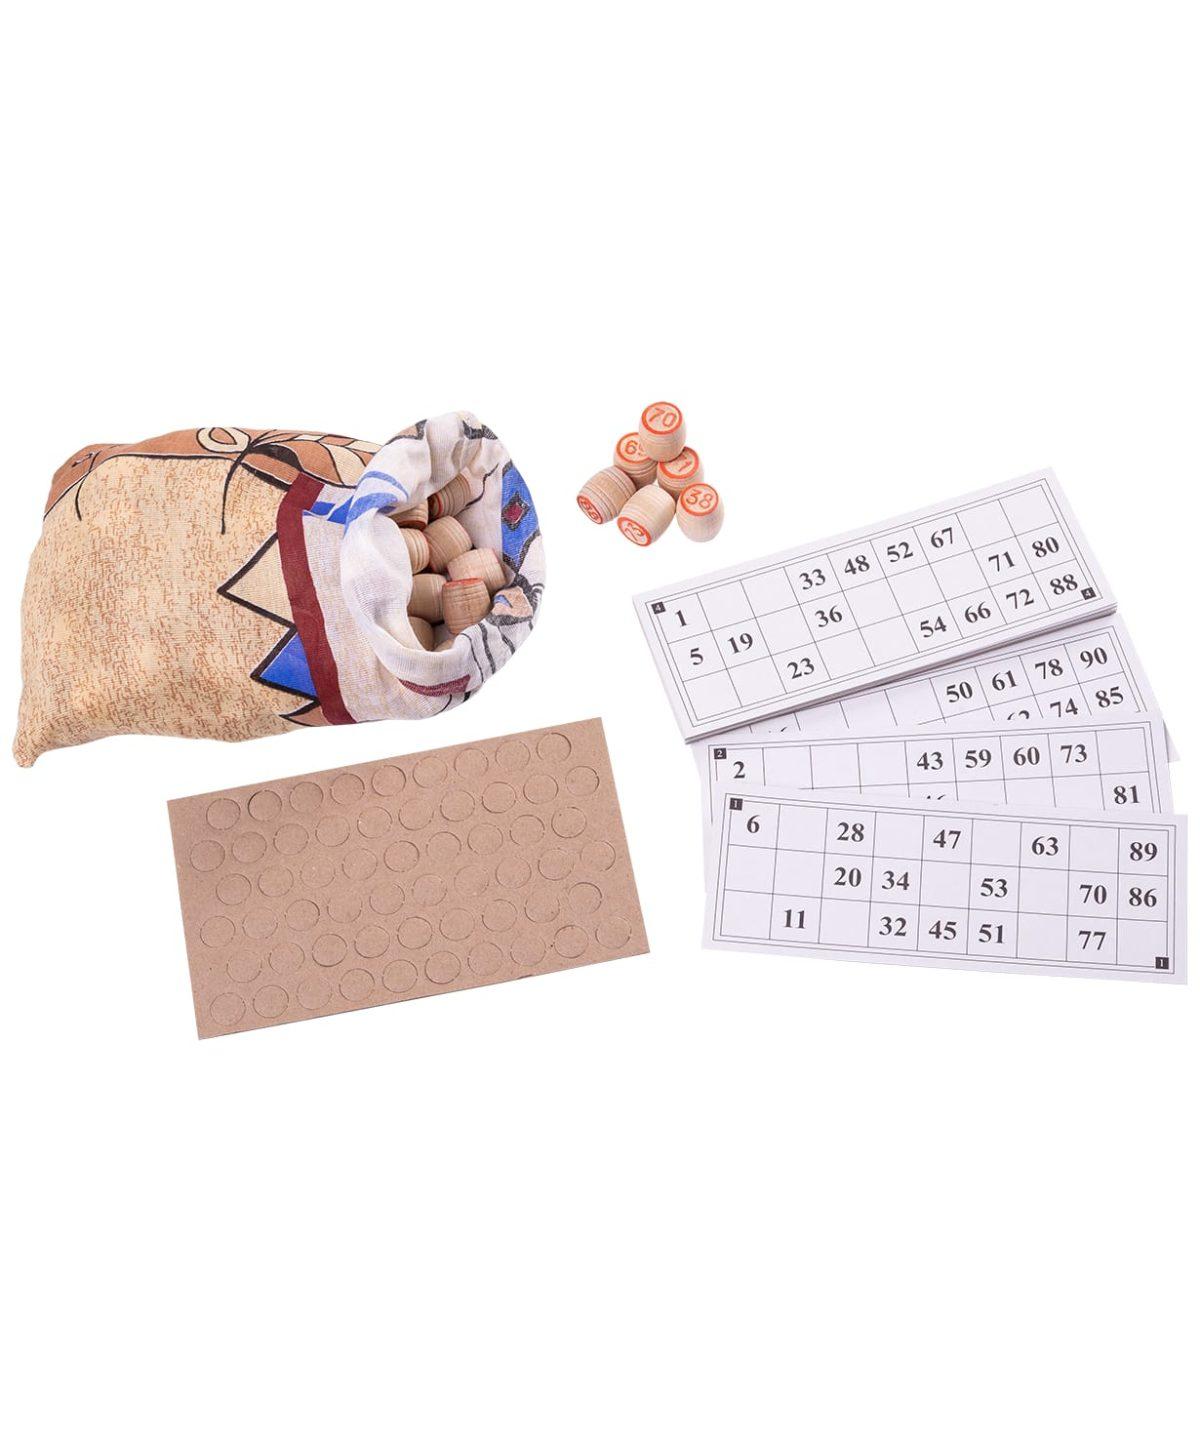 Лото бочонок деревянный, картонная коробка  004-07 - 3